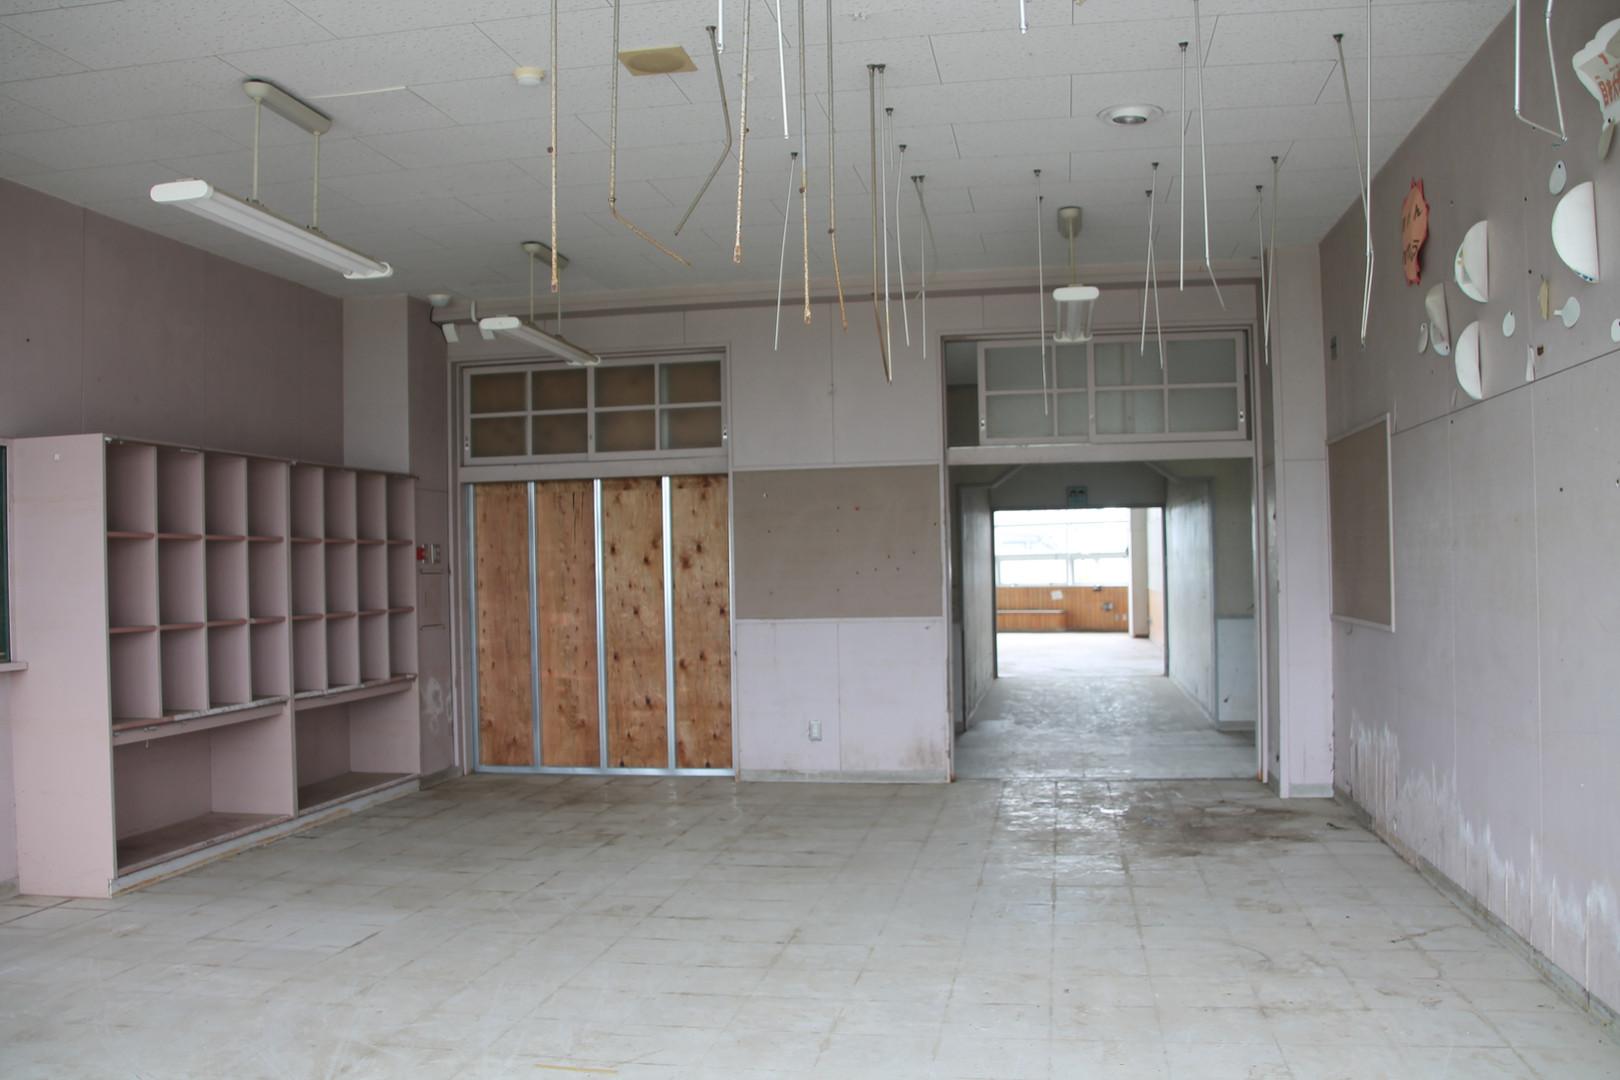 Abandoned Sendai middle school since tsu